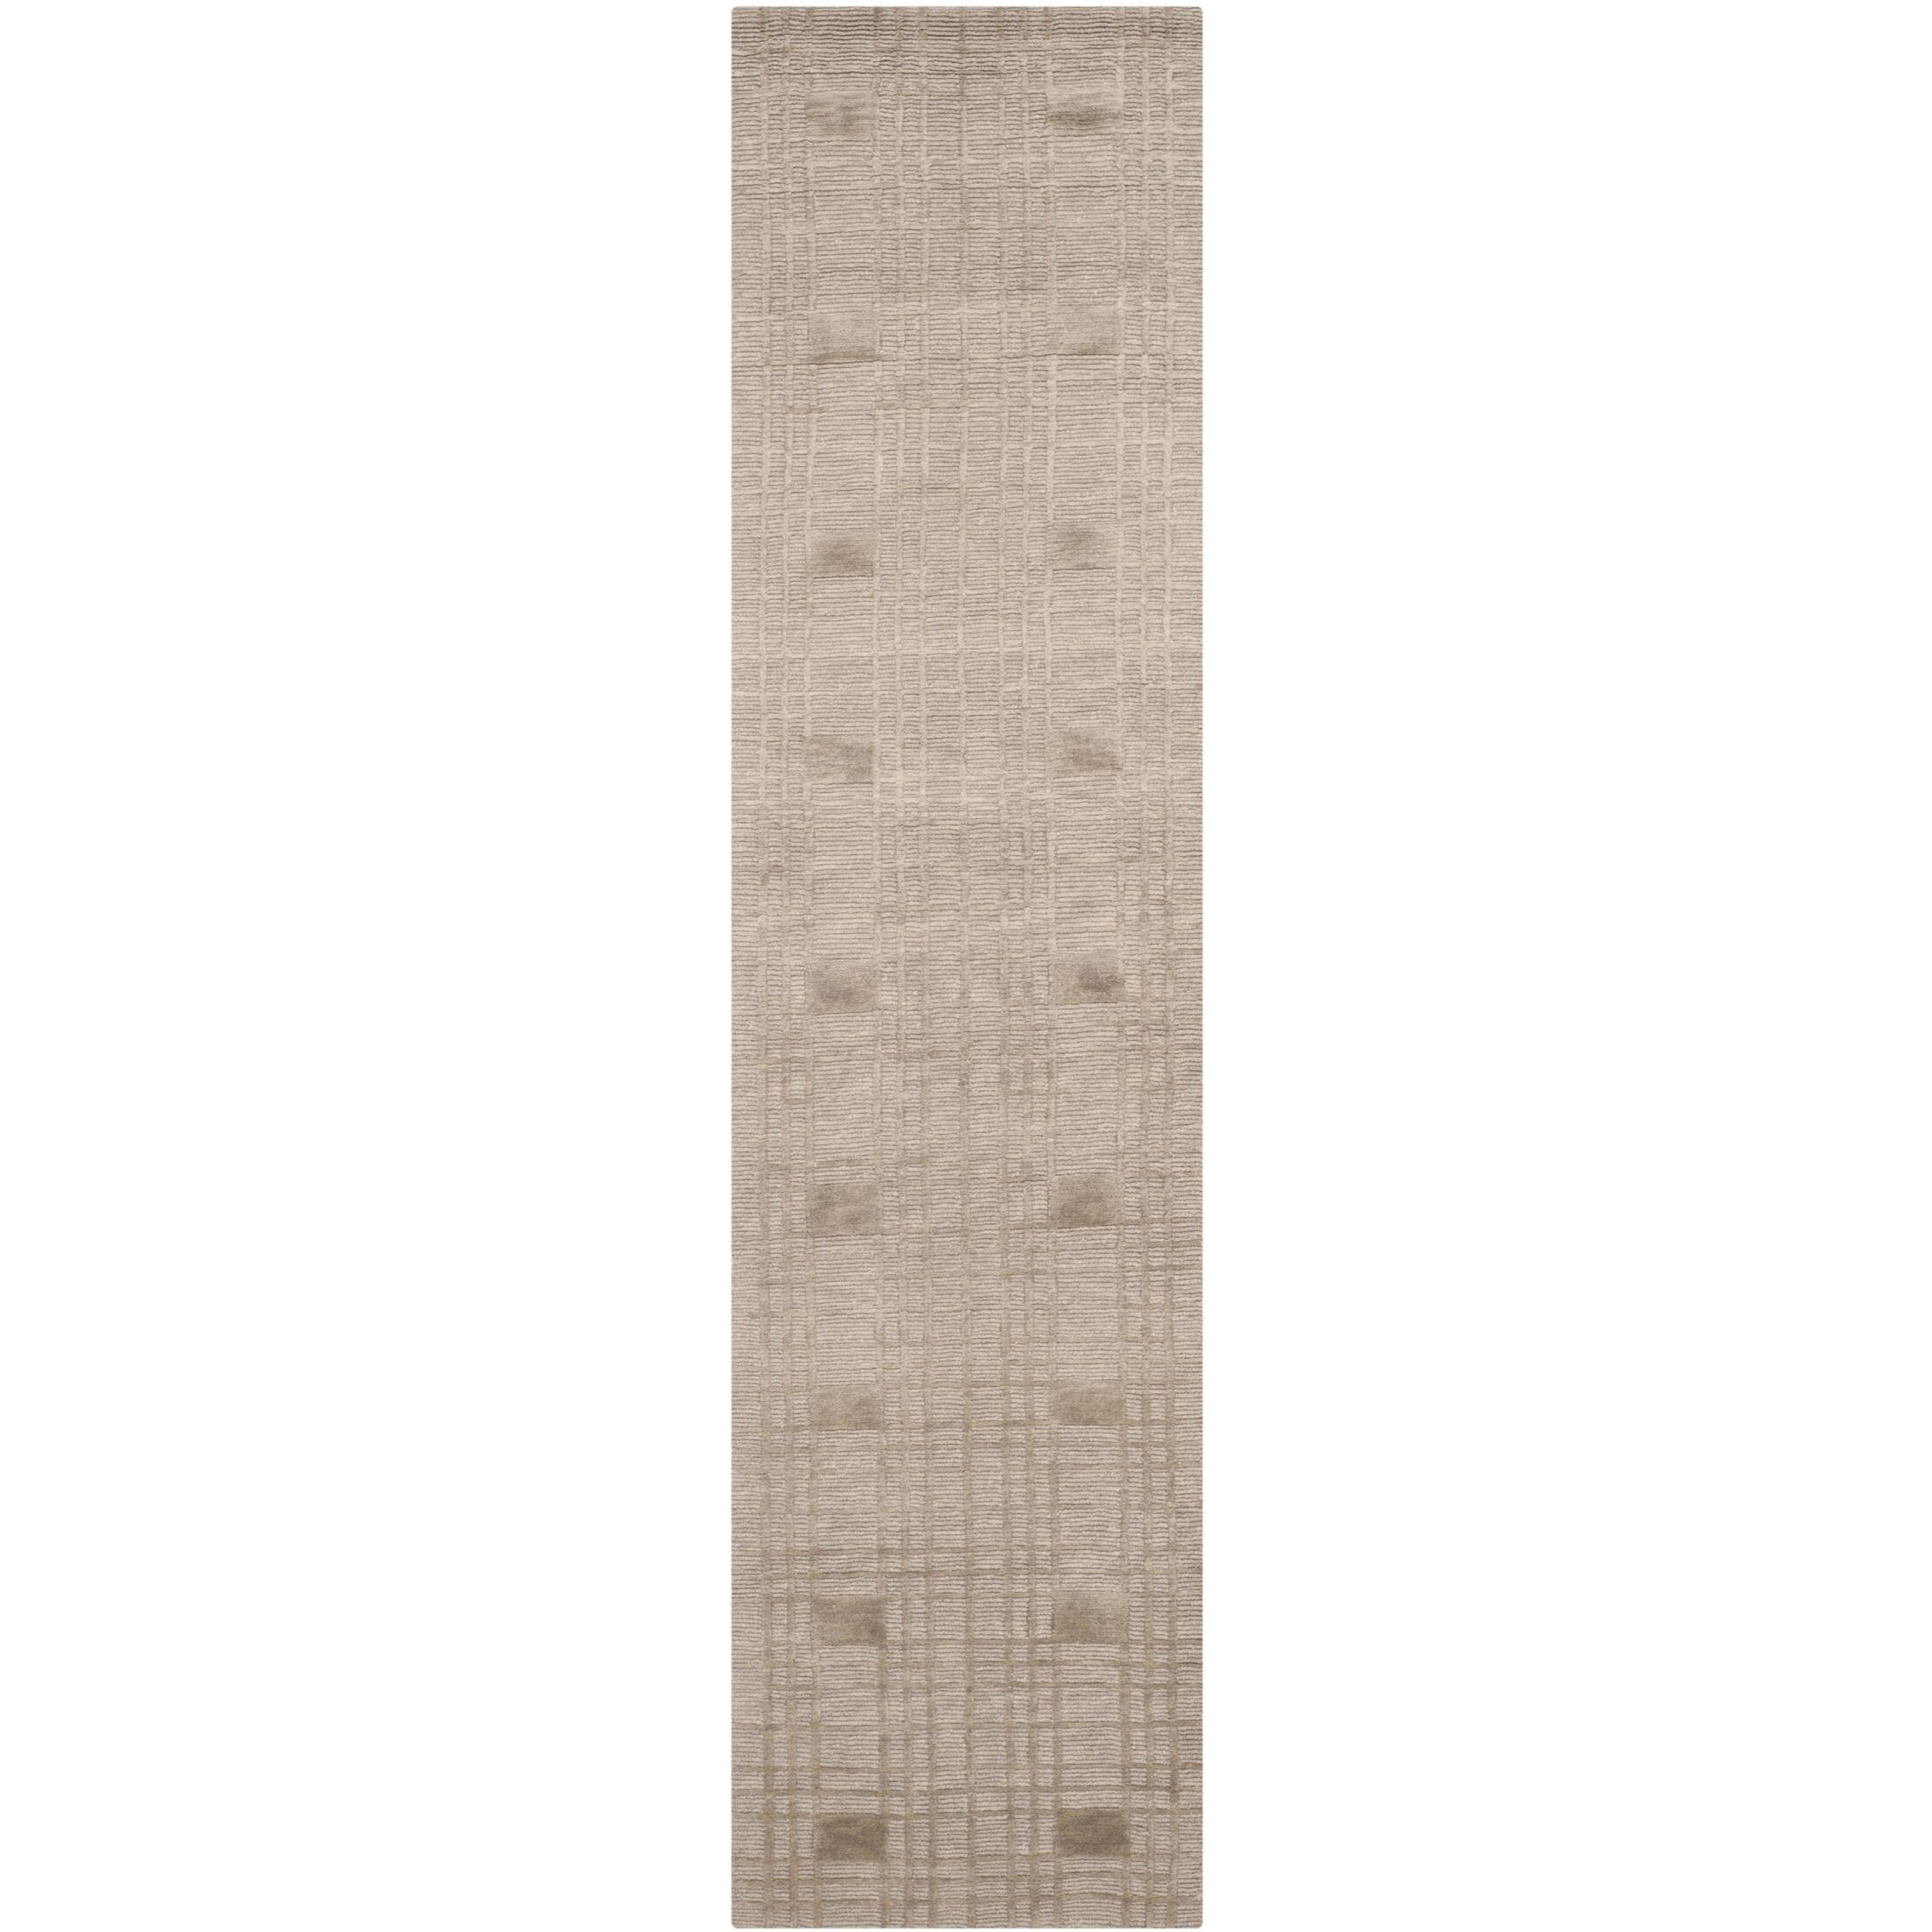 Slate Area Rug Rug Size: Runner 2'6